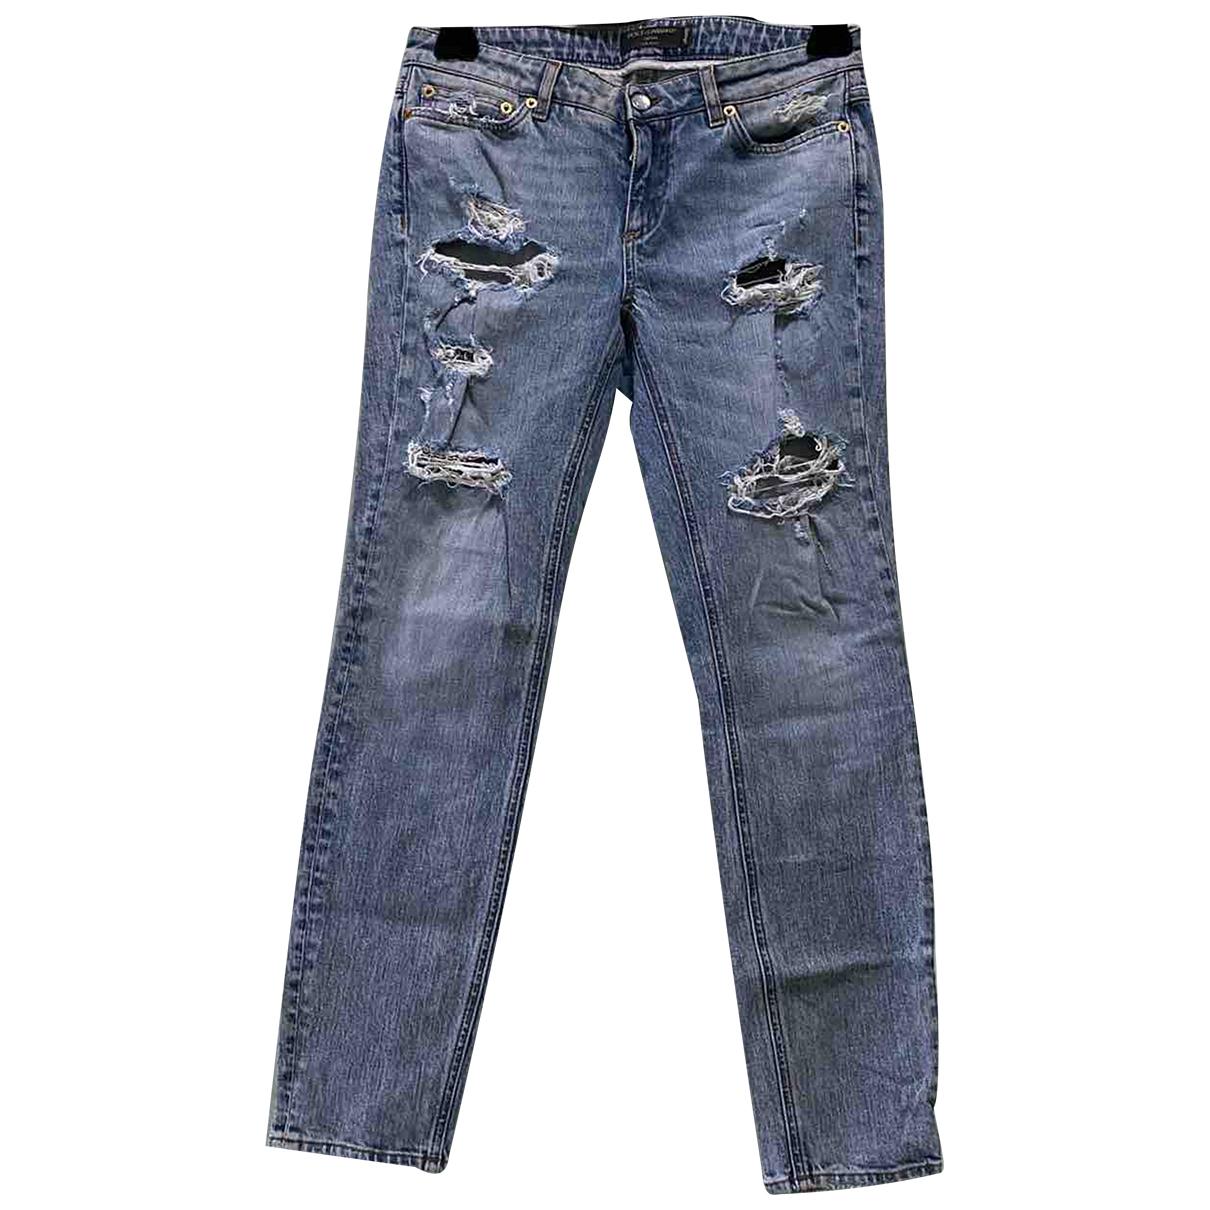 Dolce & Gabbana N Blue Denim - Jeans Jeans for Women 38 FR